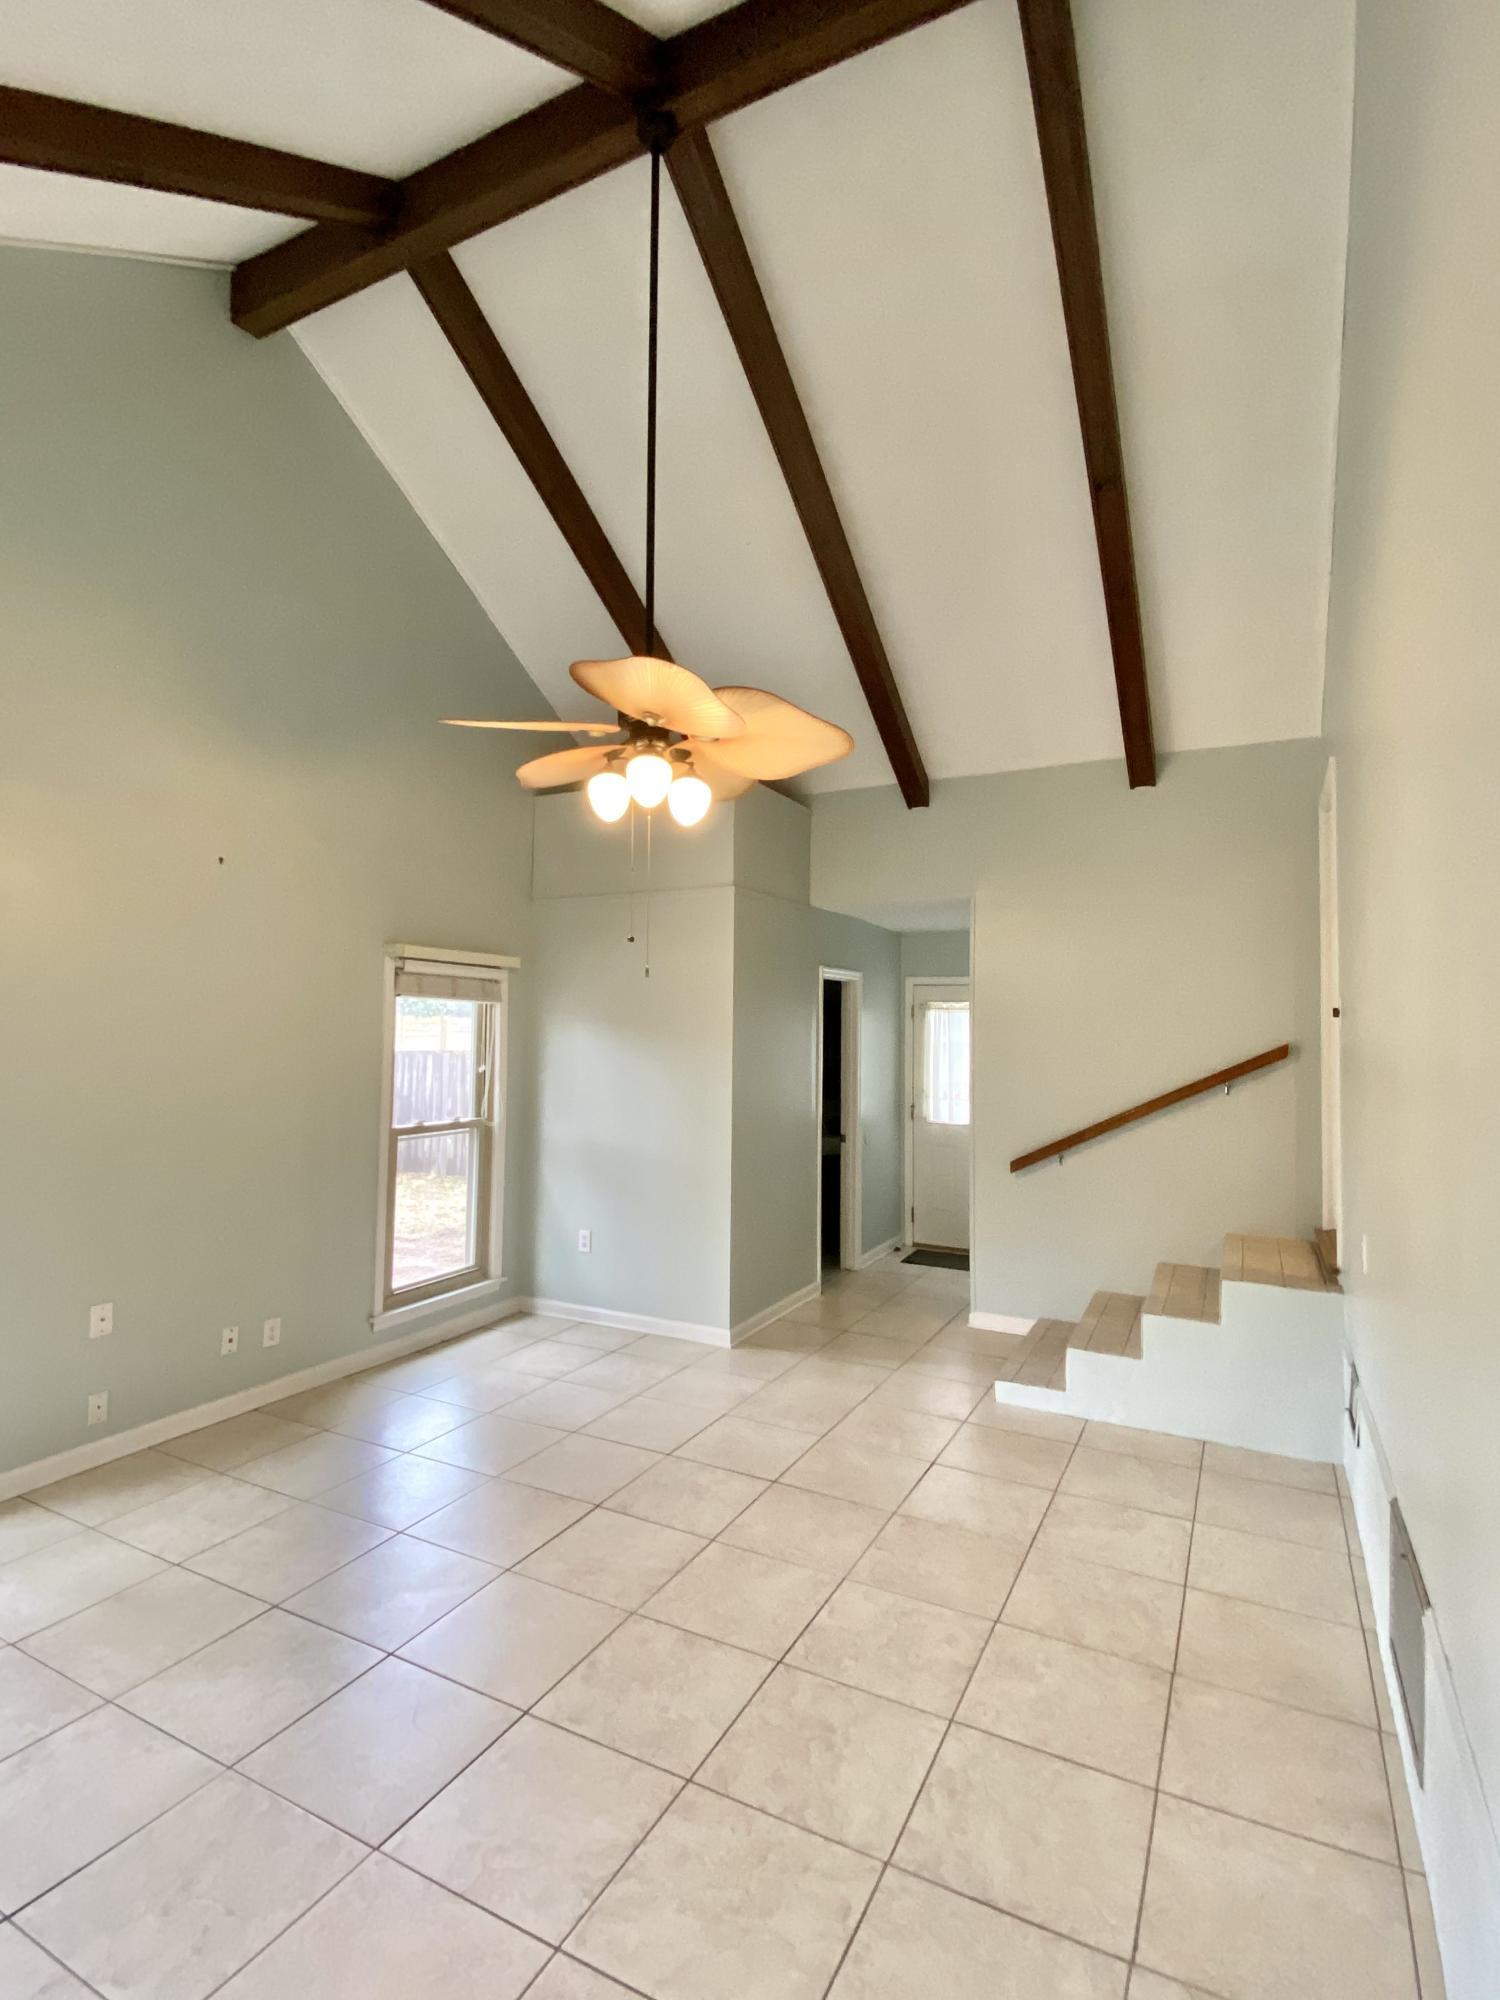 Palmetto Fort Homes For Sale - 1510 Lakeshore, Mount Pleasant, SC - 18